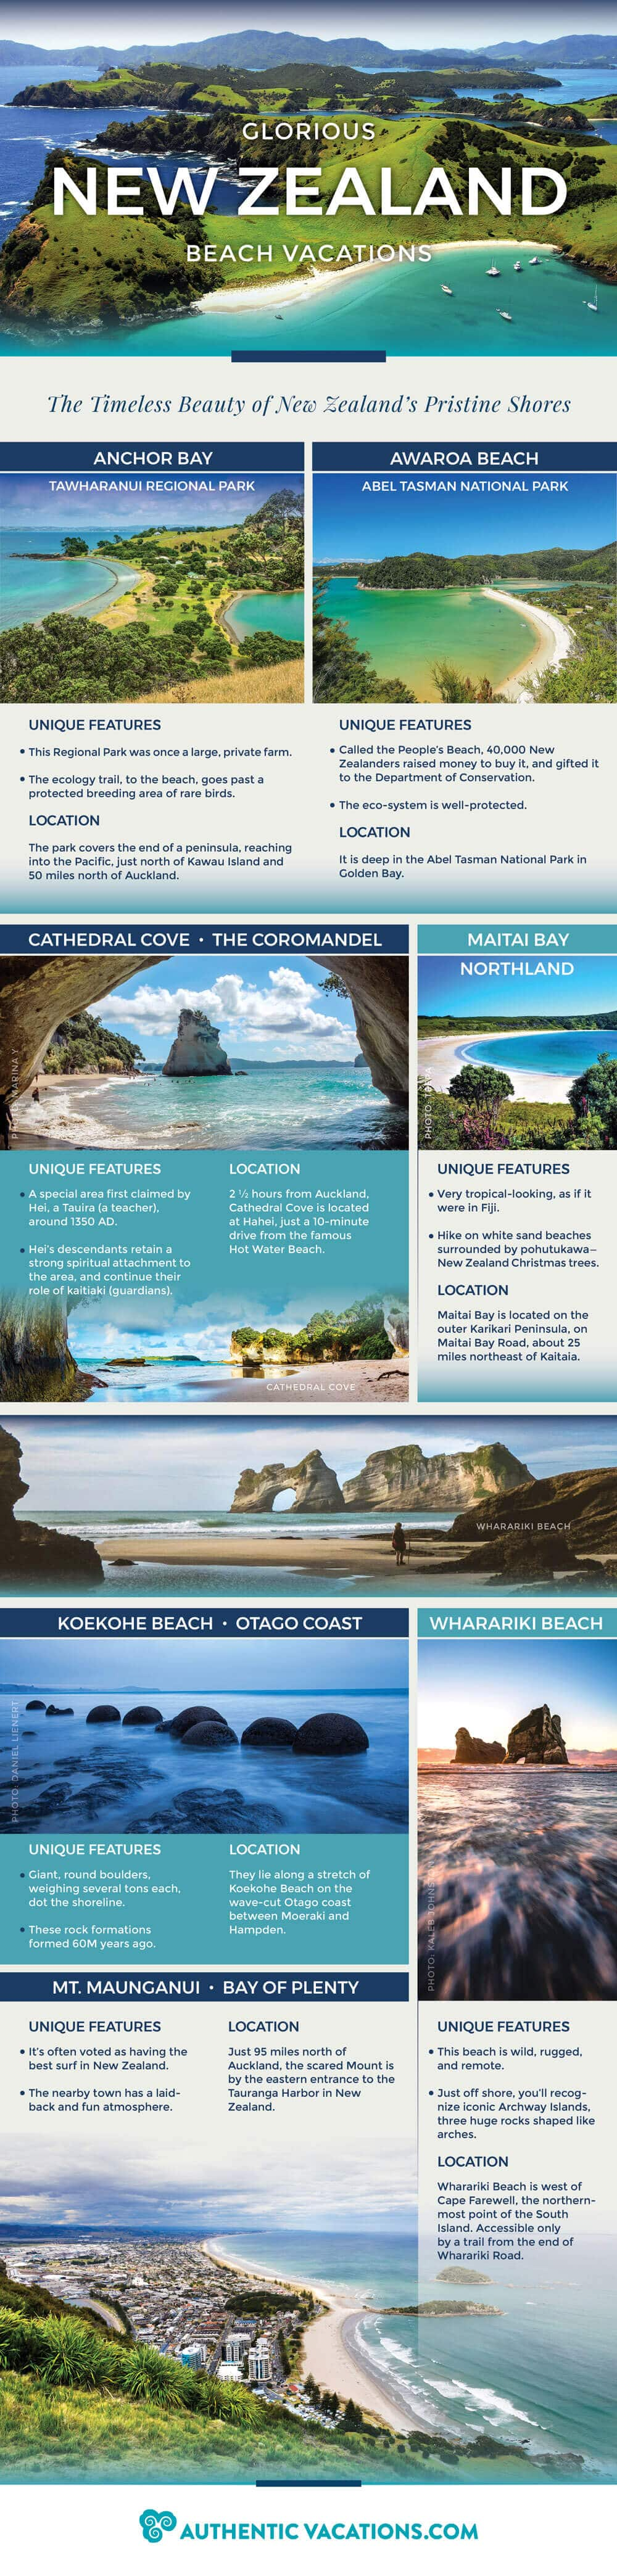 Glorious New Zealand Beach Vacations